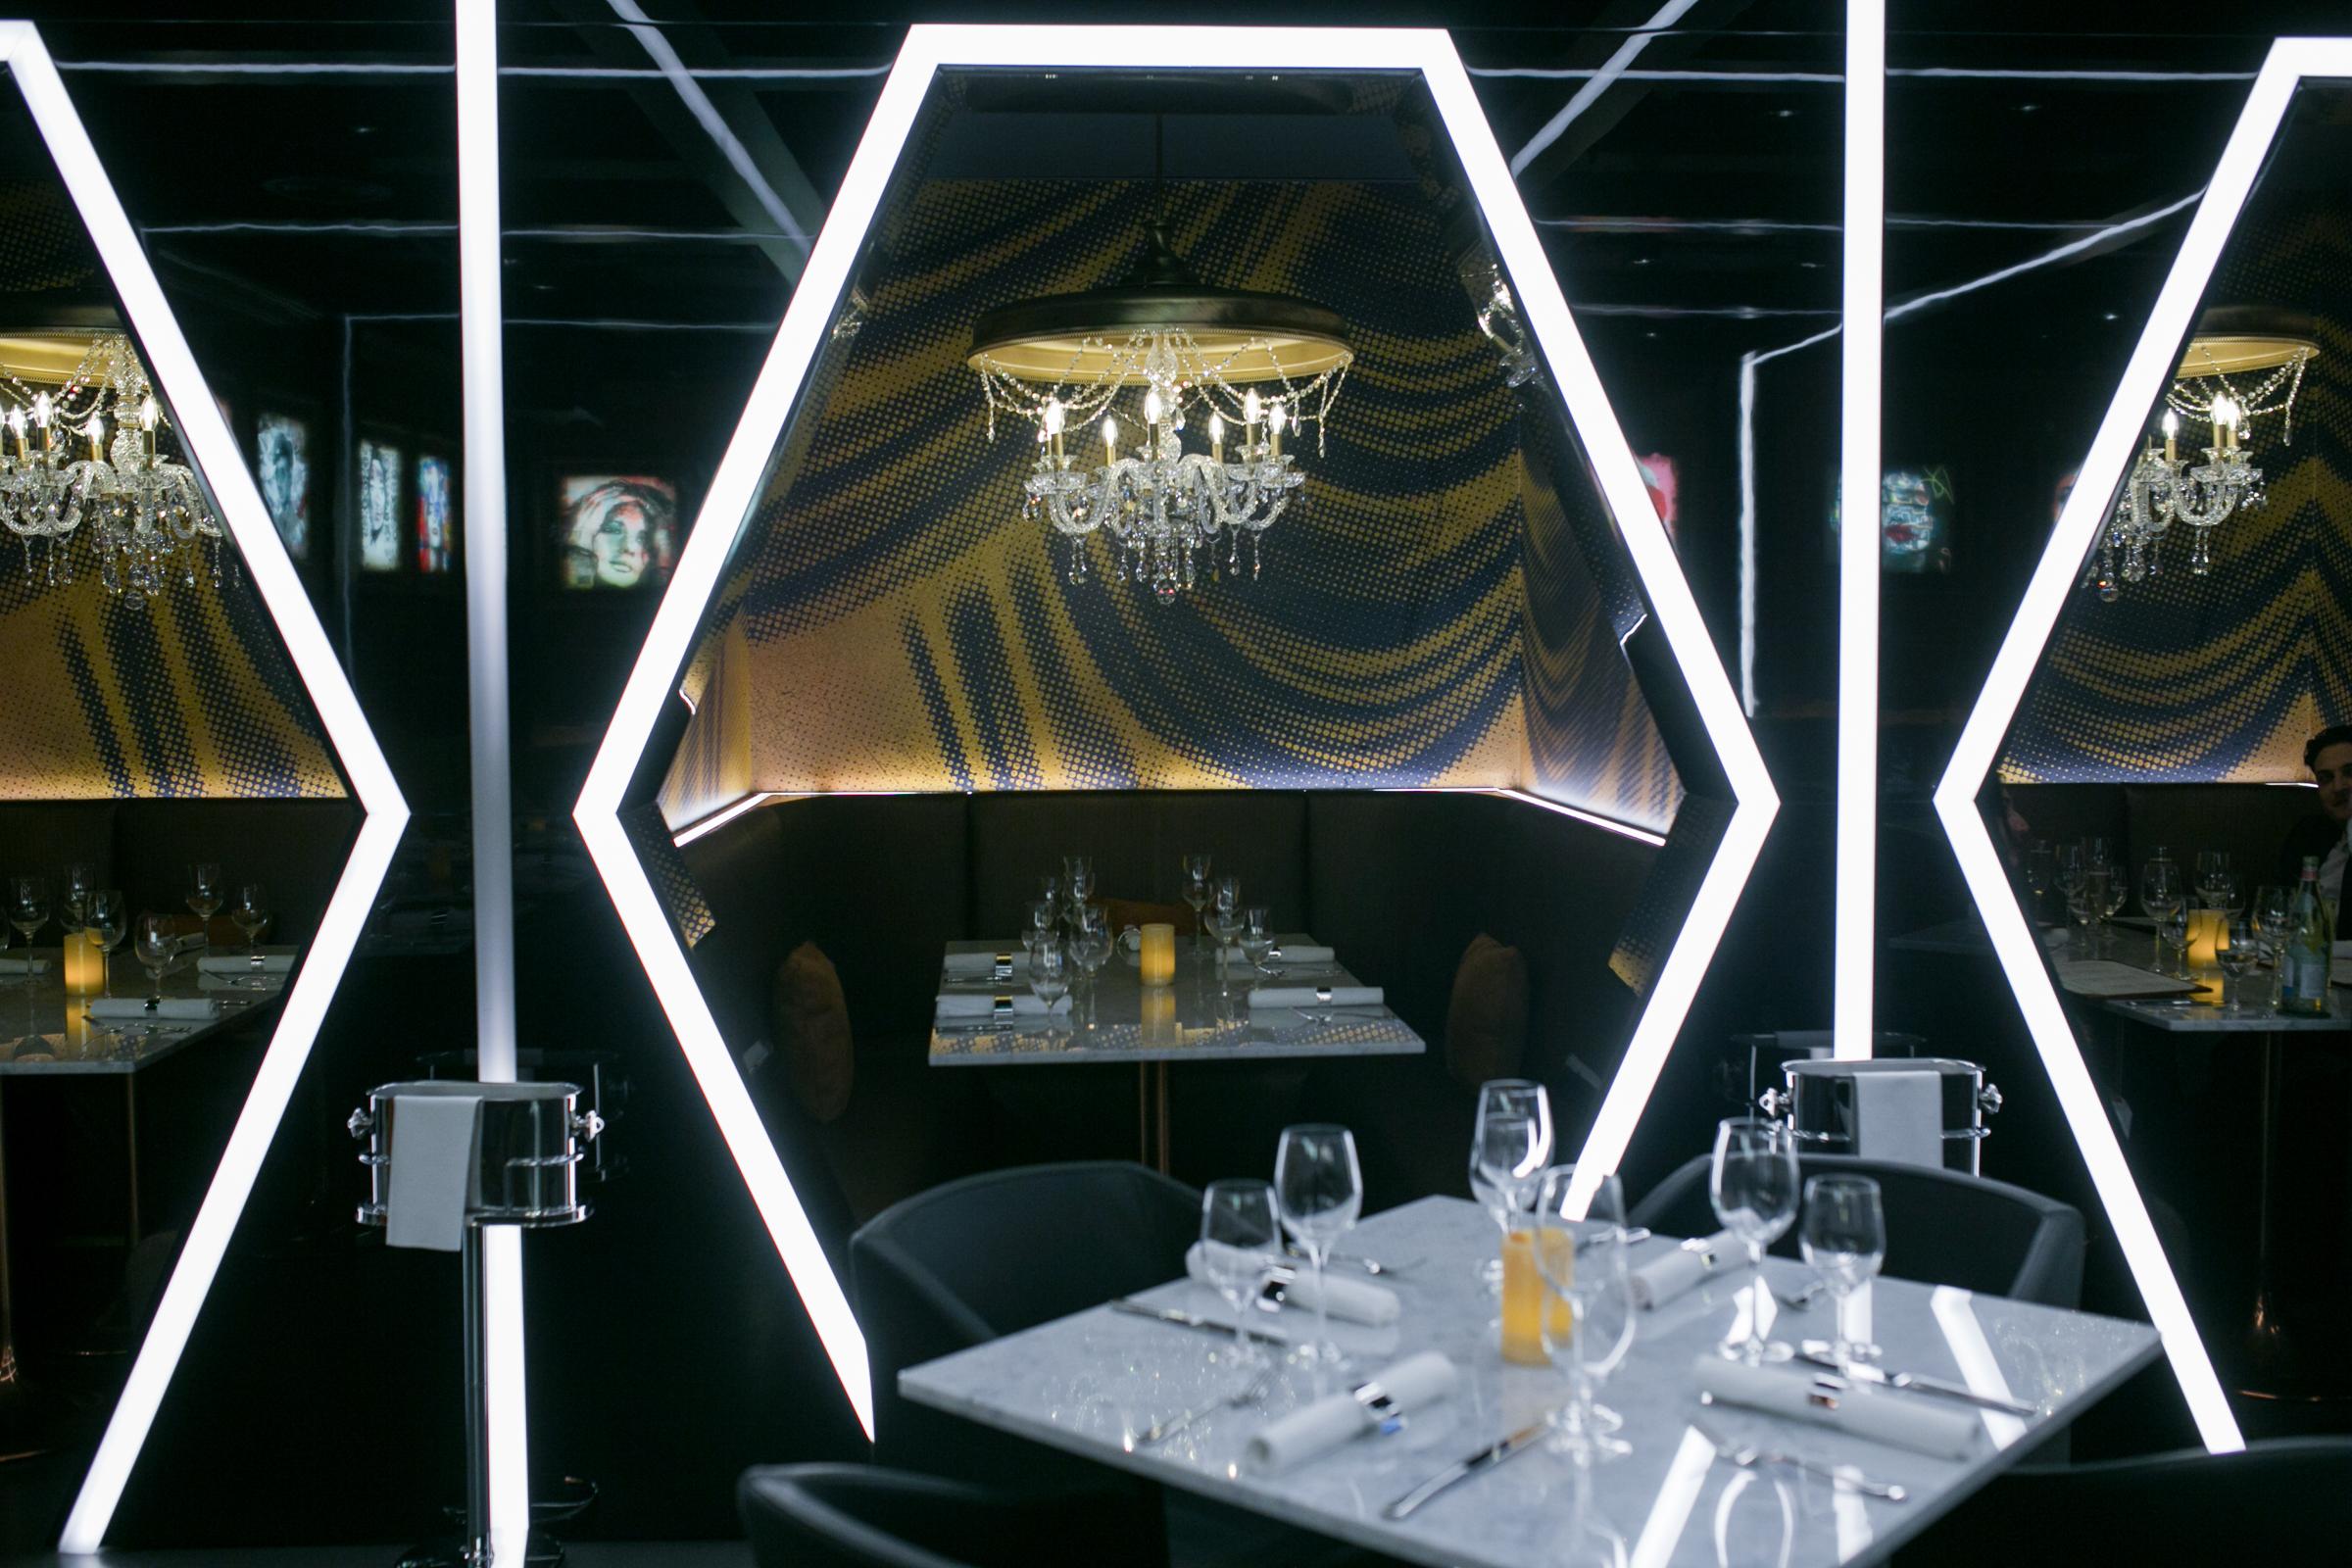 Caramel-restaurant-and-lounge-london-abu-dabi-dubai-oman-new-restaurant-in-london-minas-planet-review-jasmina-haskovic3.jpg